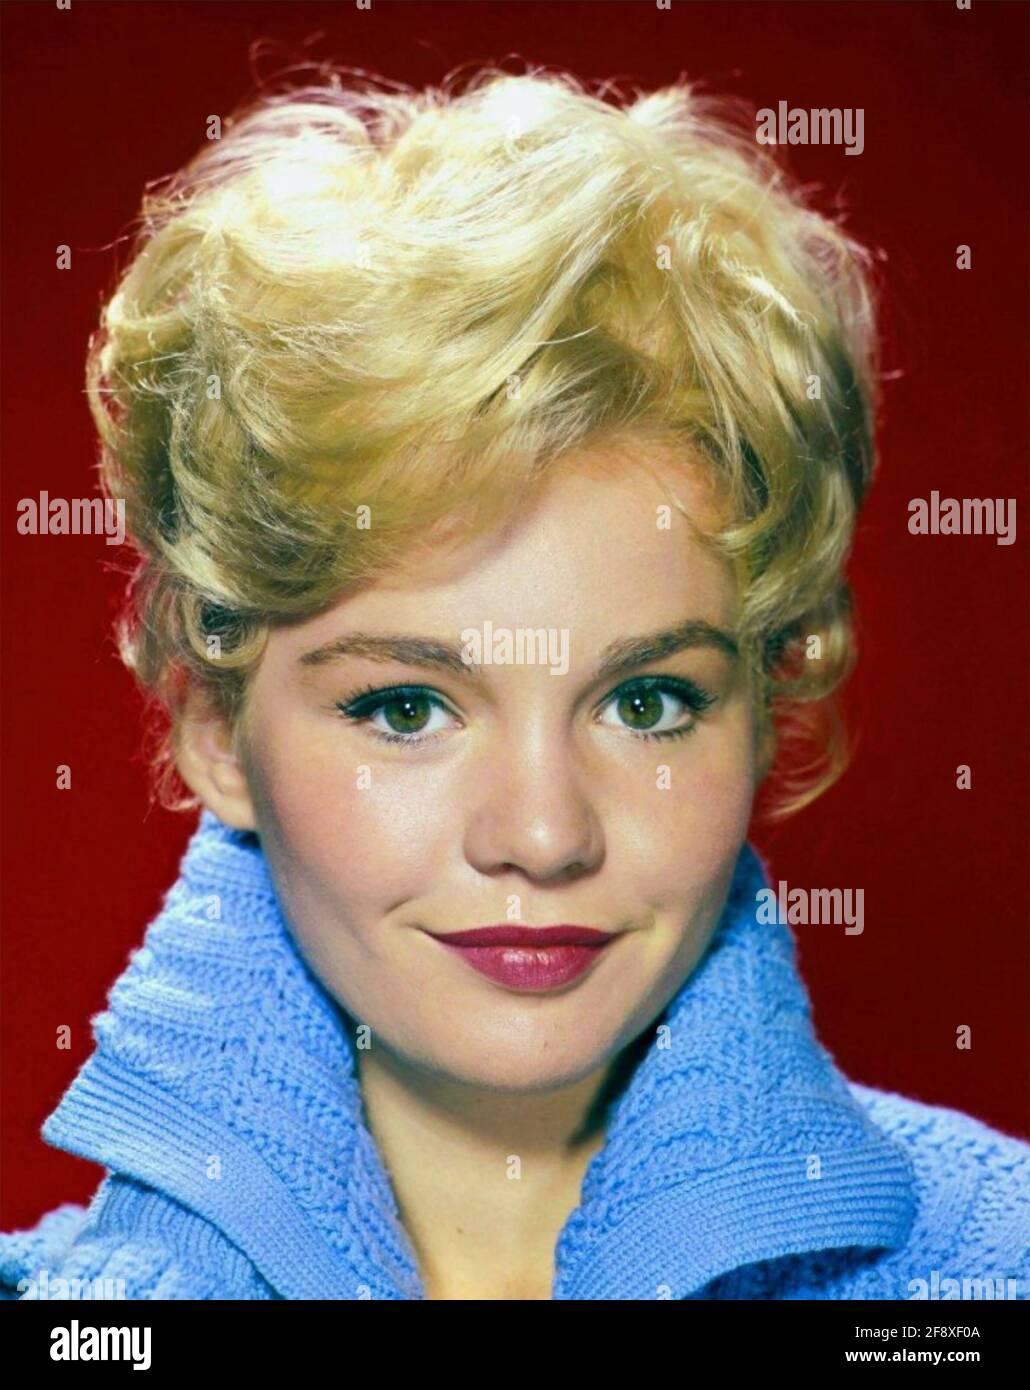 MARTEDÌ SALDATURA attrice film americano circa 1960 Foto Stock